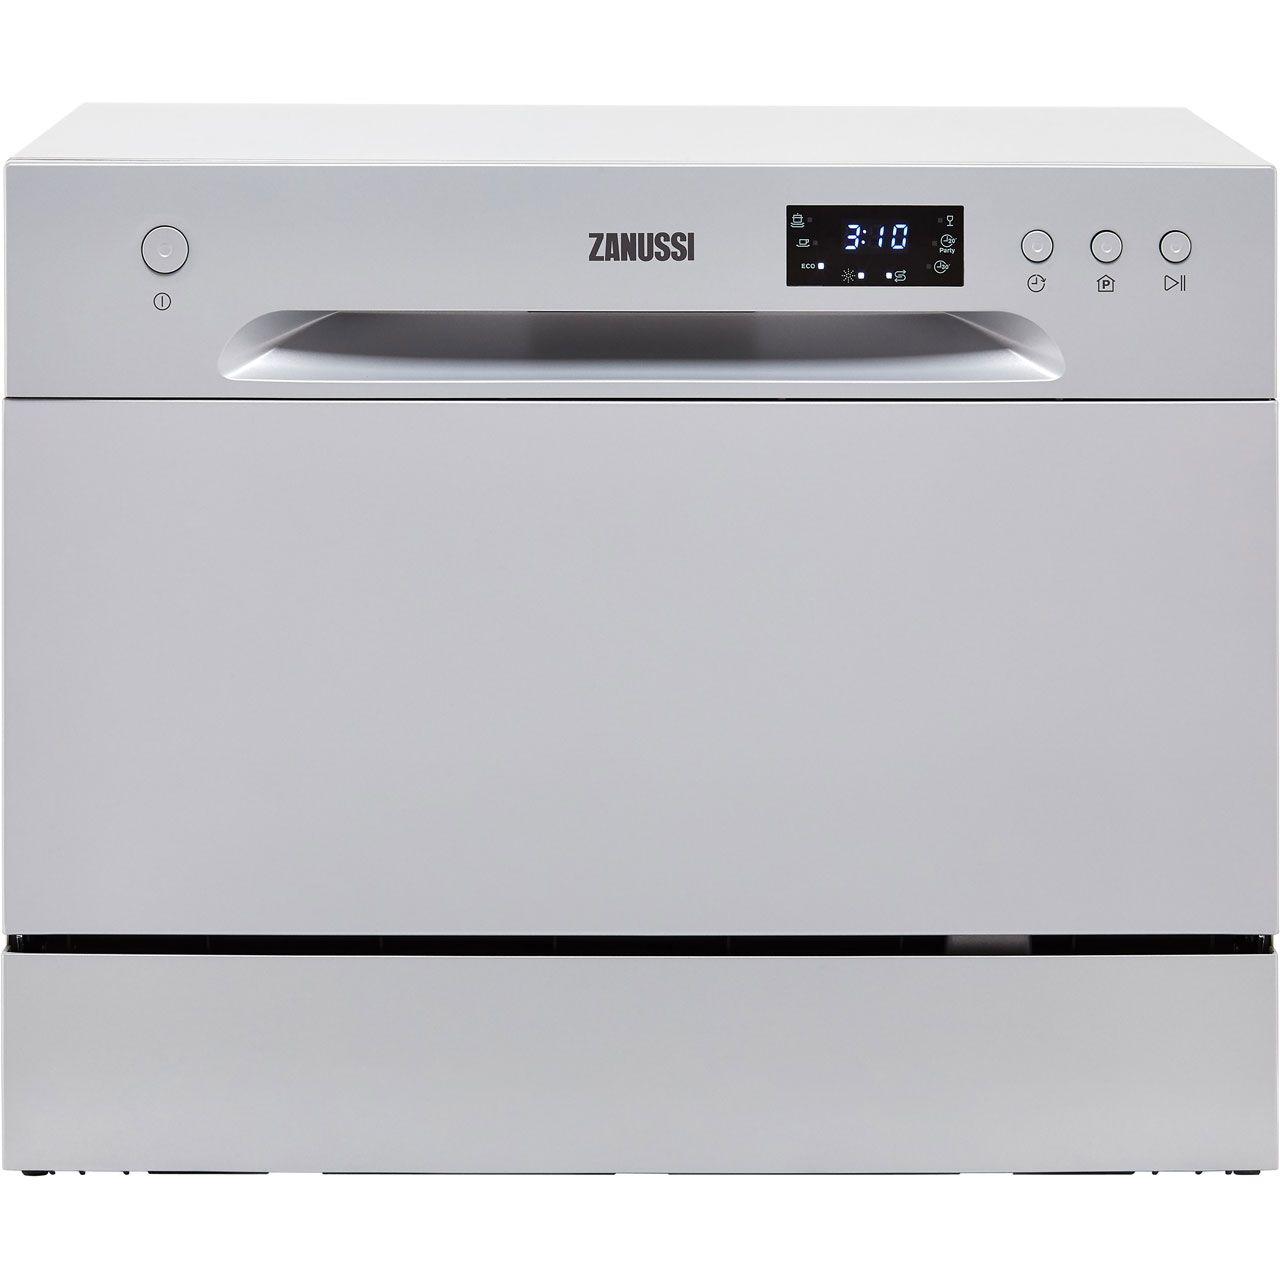 Zanussi Zdm17301sa Table Top Dishwasher Silver A Rated